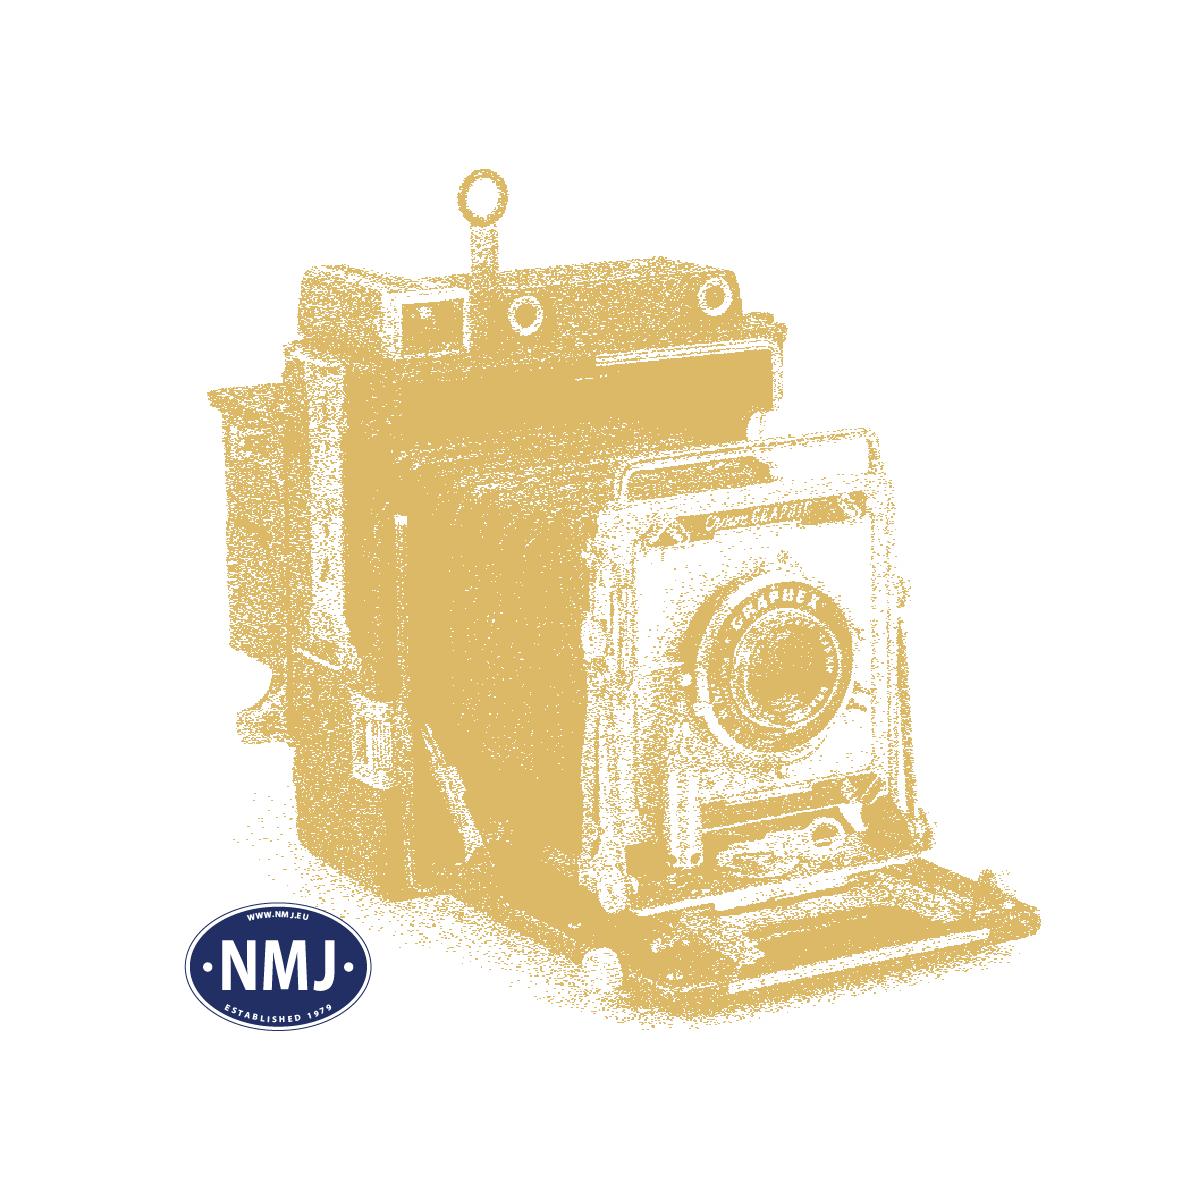 NMJT507.108 - NMJ Topline CargoNet Lgns 42 76 440 2015-8, Tollpost-Globe Thermo